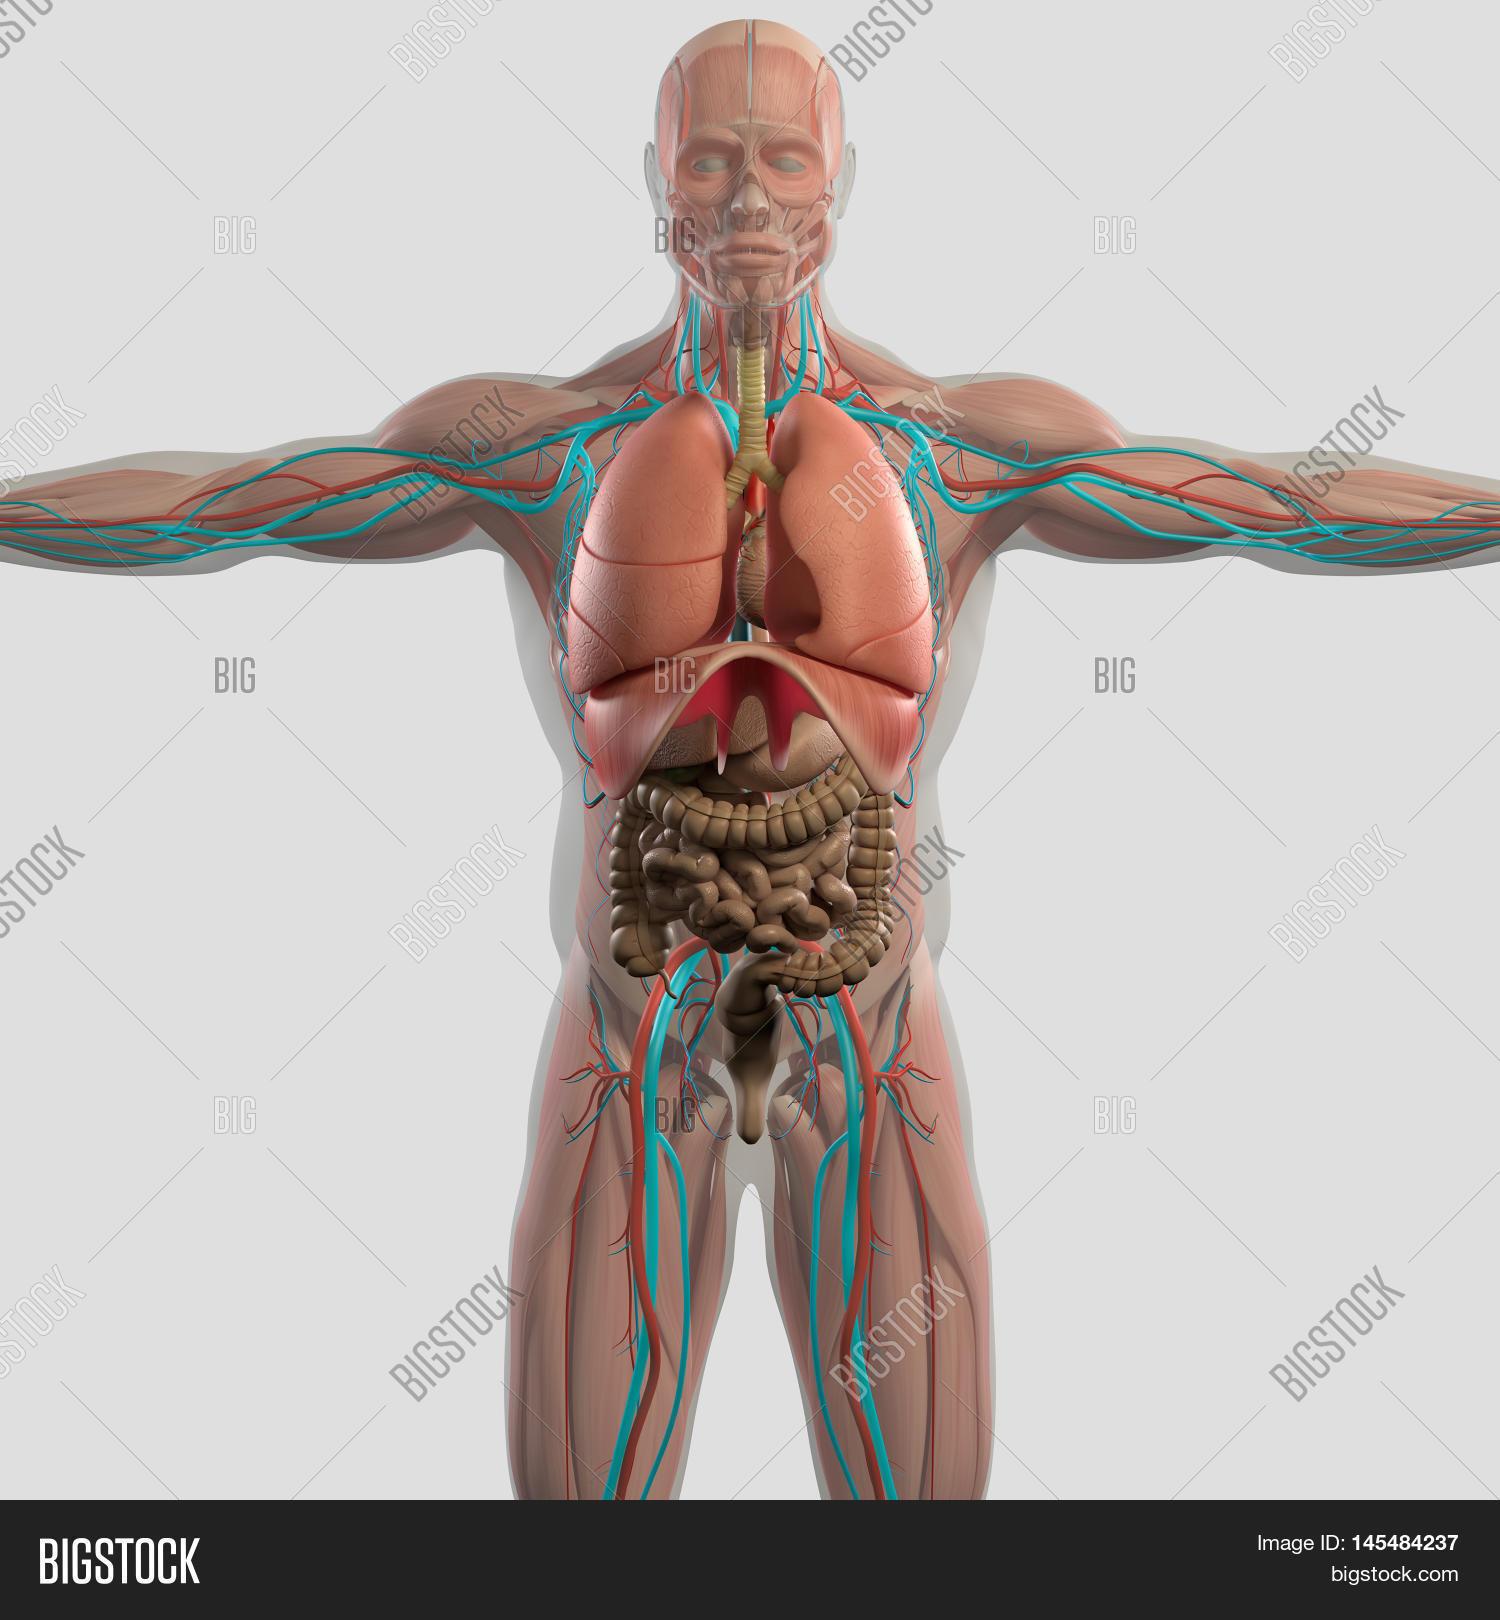 Human Anatomy Male Image Photo Free Trial Bigstock